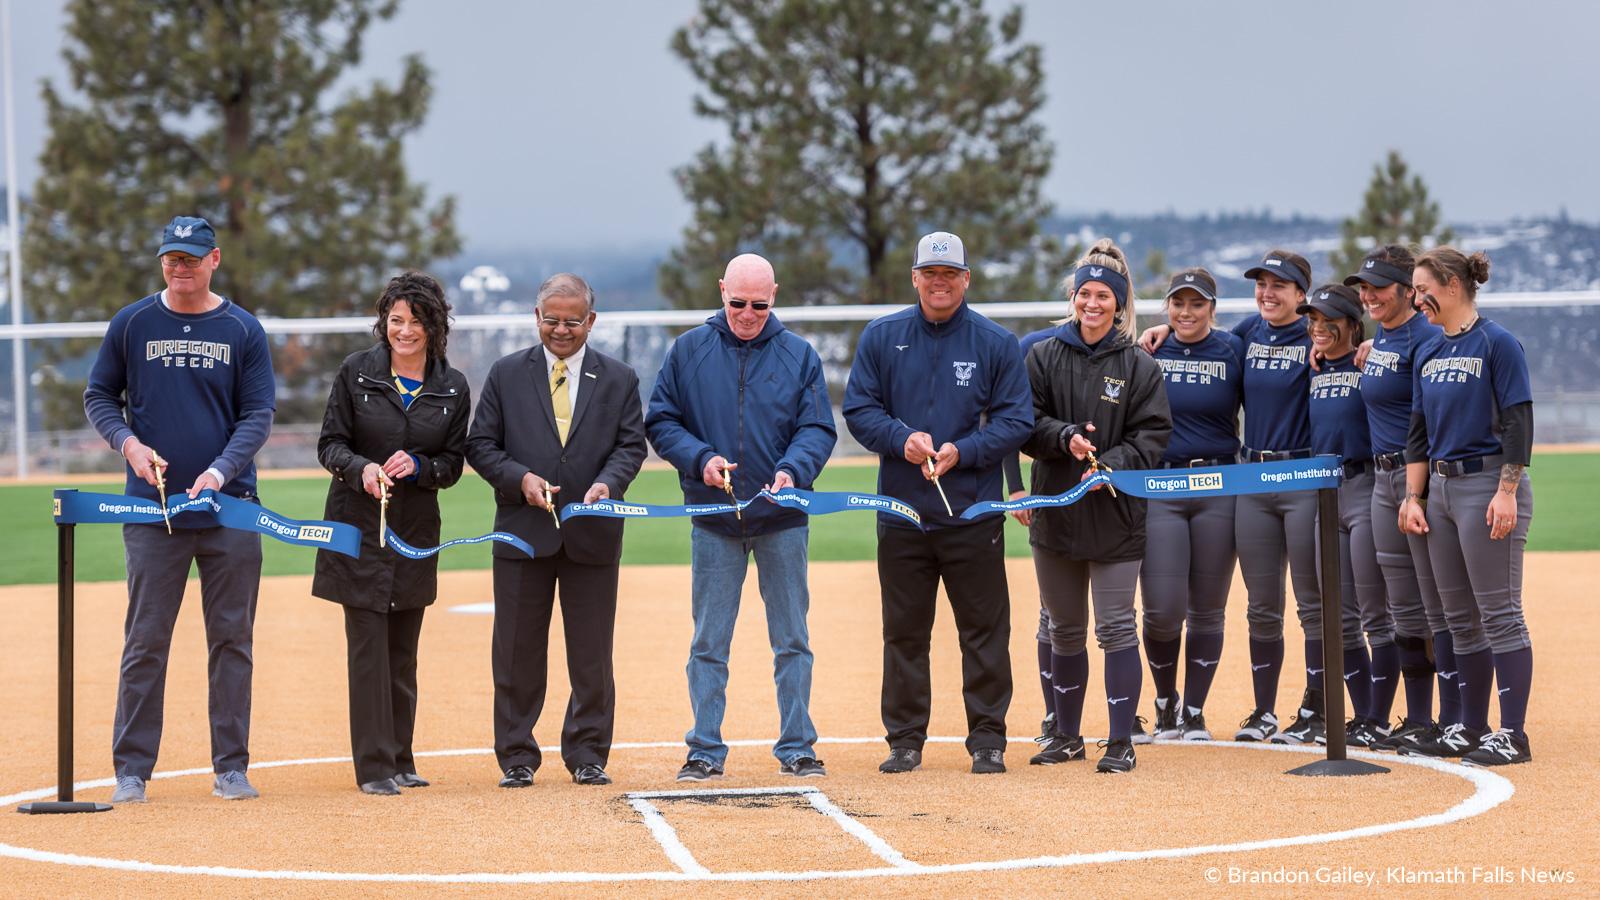 Ribbon cutting during the dedication of the John and Lois Stilwell softball stadium at Oregon Tech. March 23, 2019 (Image: Brandon Gailey / Klamath Falls News)